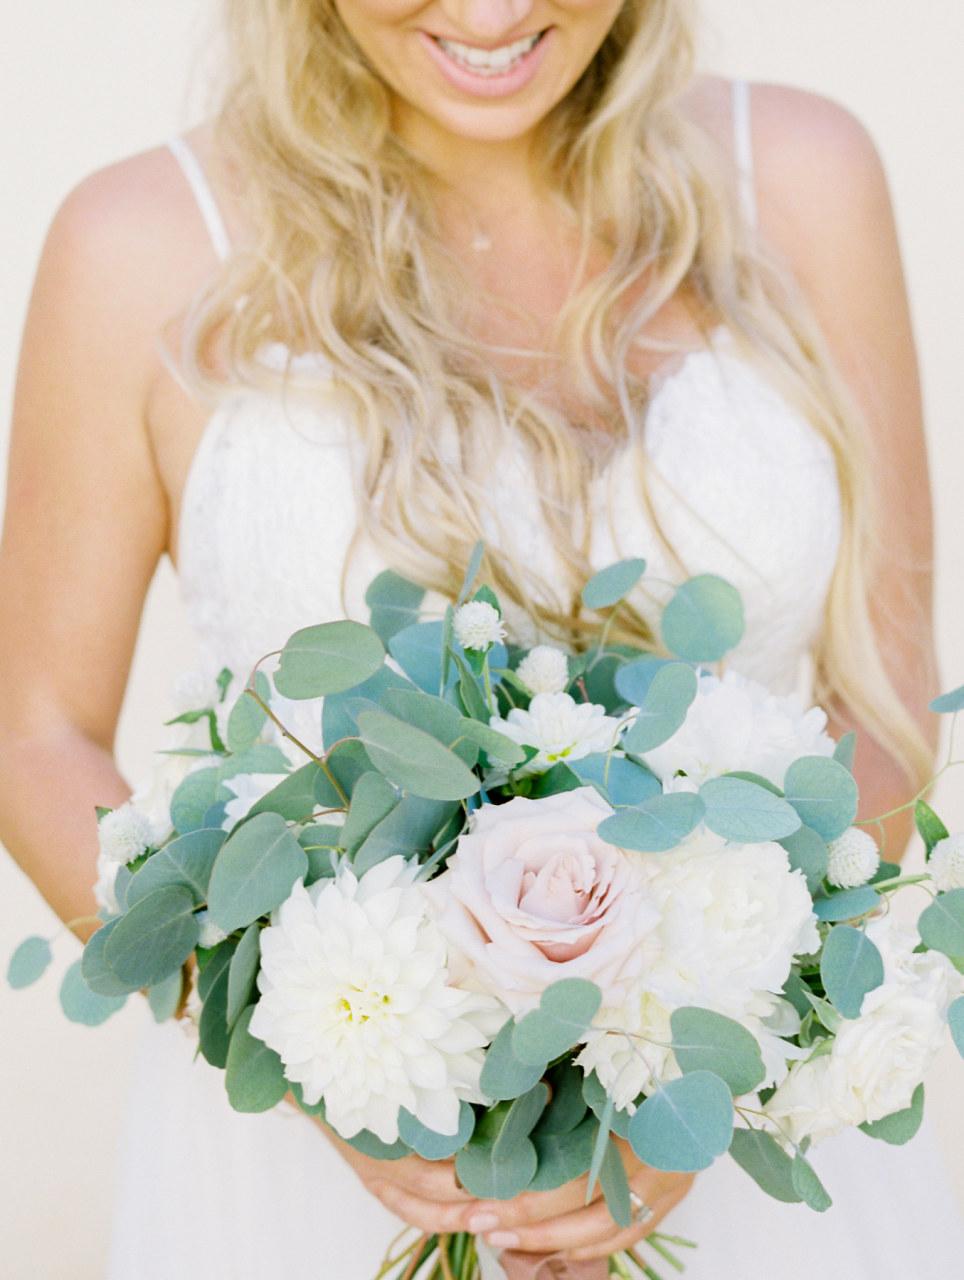 MelanieOsorioPhotographyPortraits63.jpg